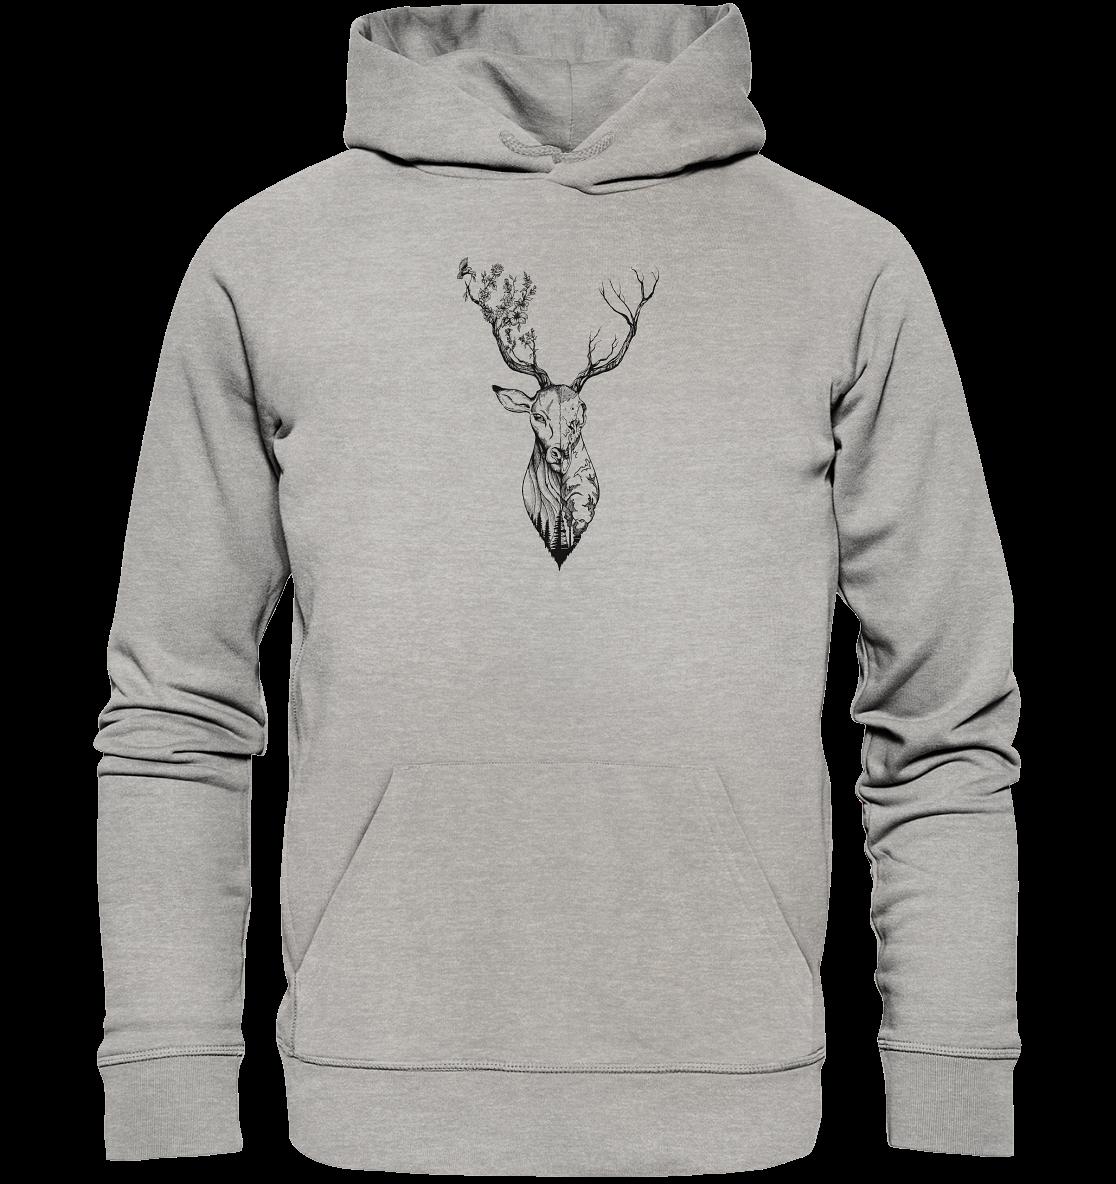 front-organic-hoodie-c2c1c0-1116x-8.png